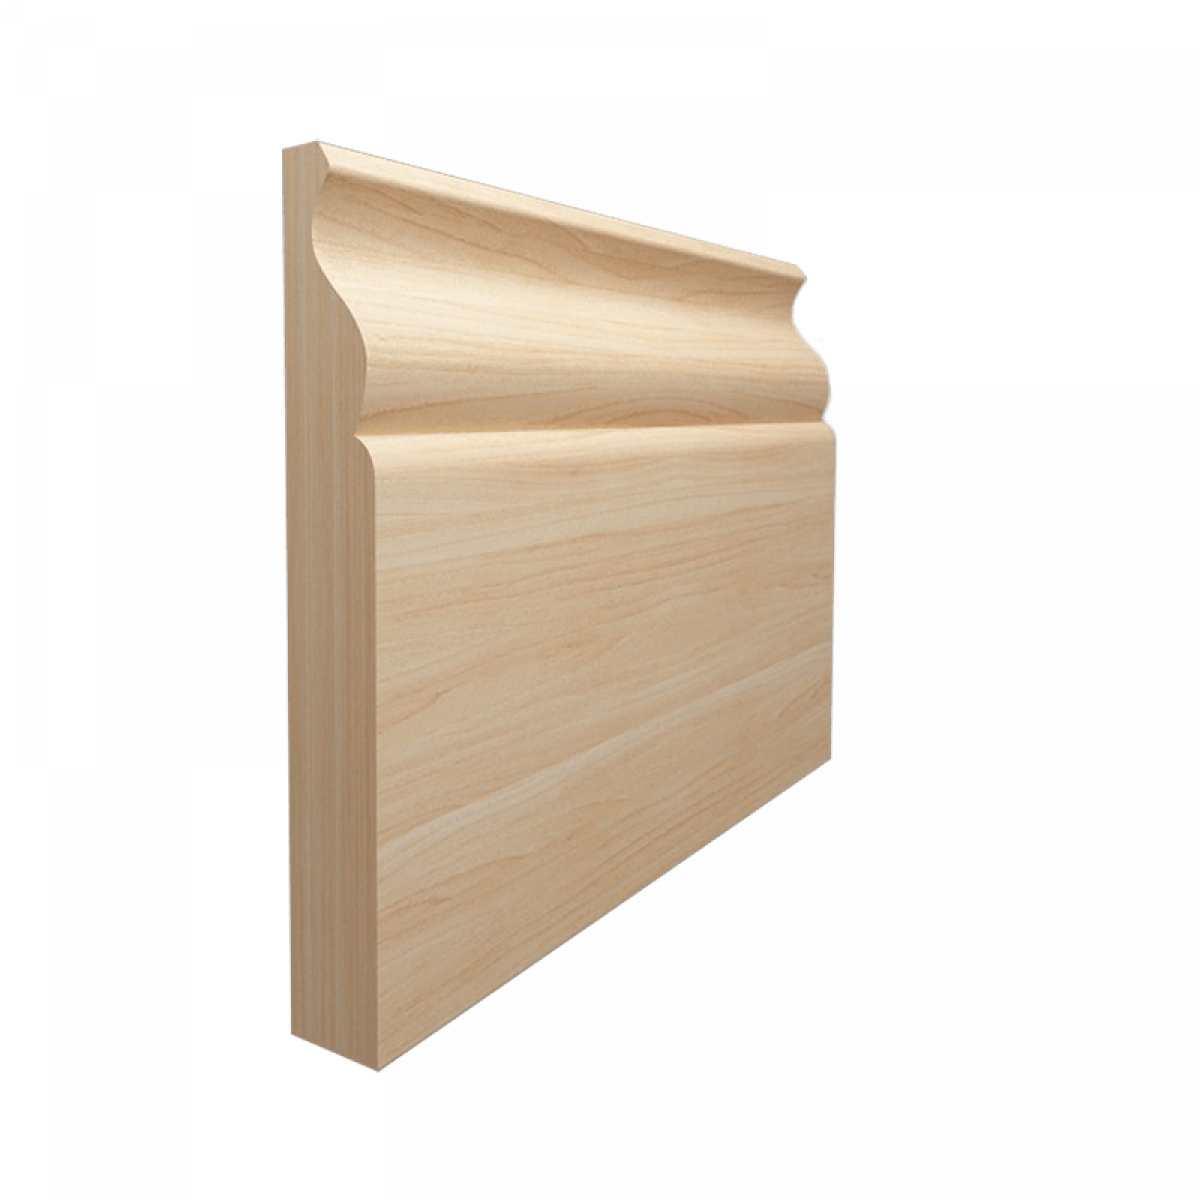 ogee pine skirtingboard websterstimber 2 Image by Websters Timber